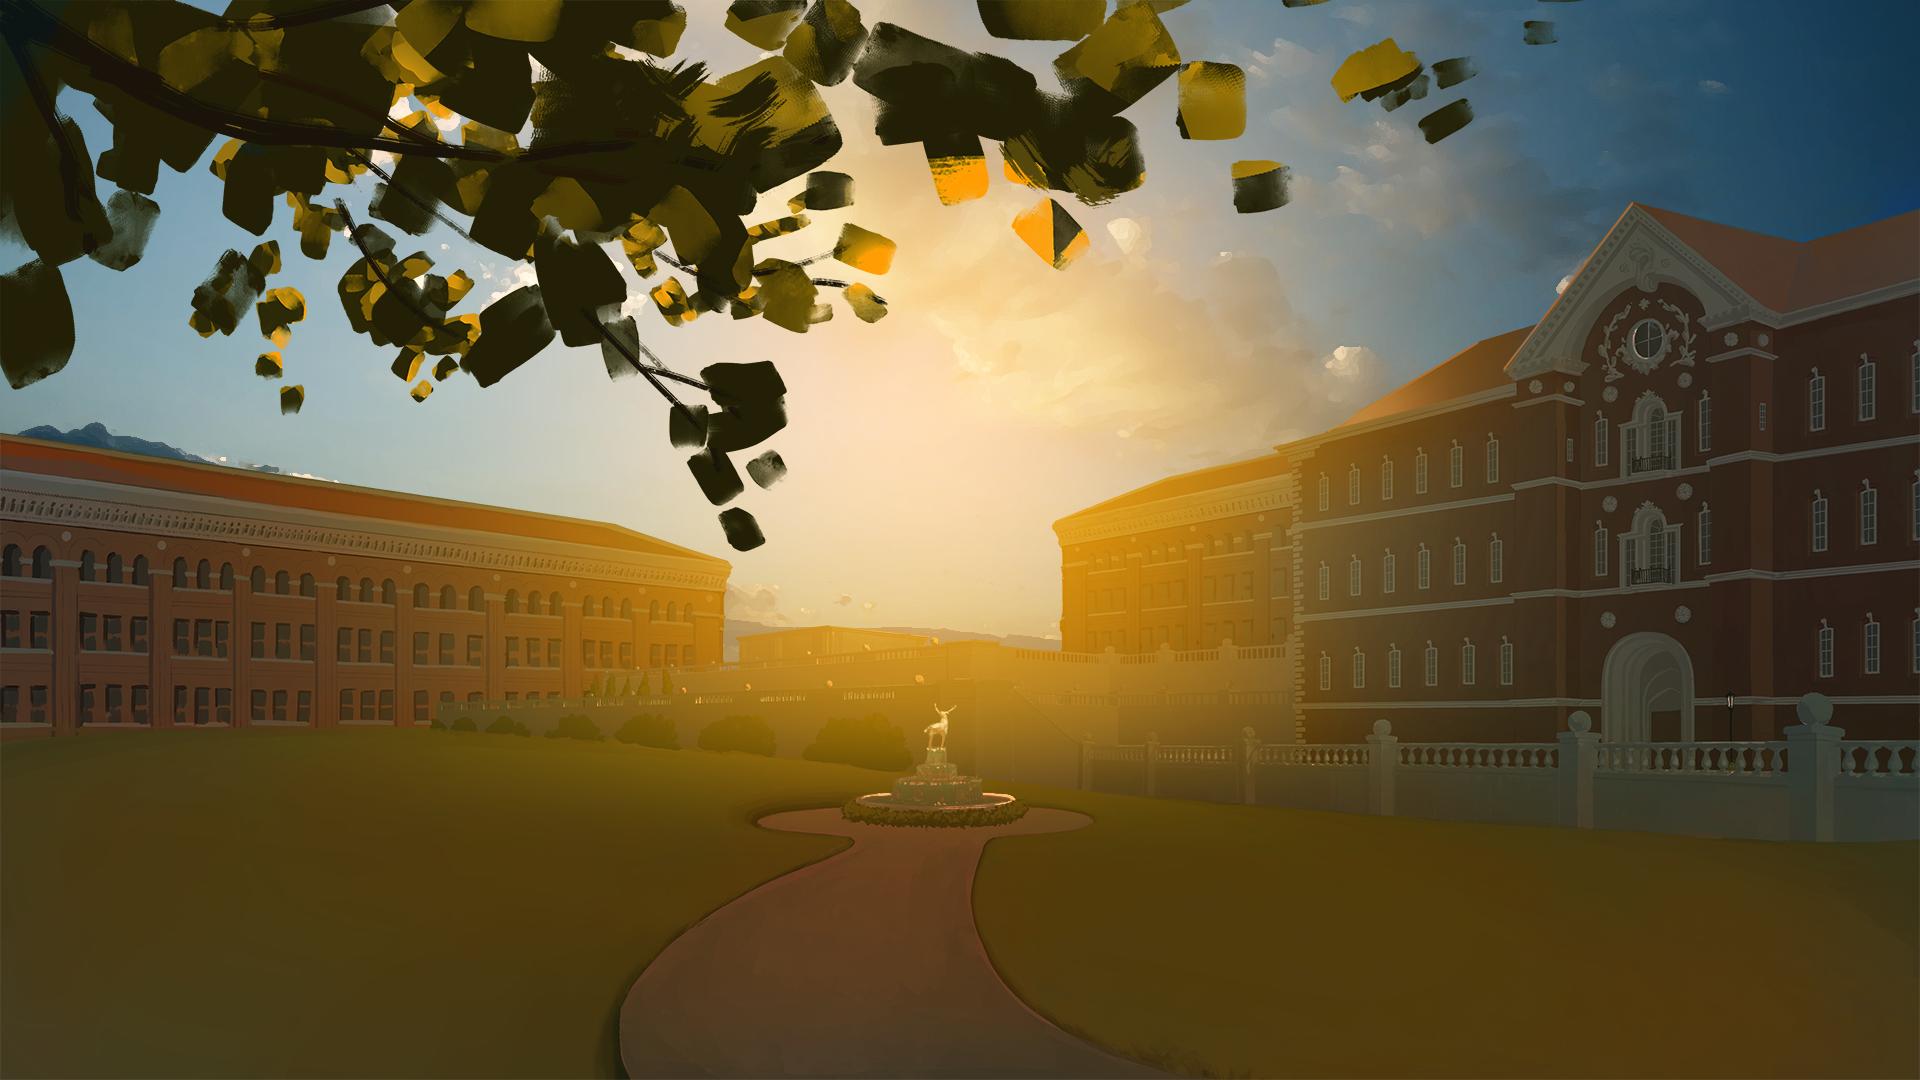 University Courtyard 02 | B. Chau